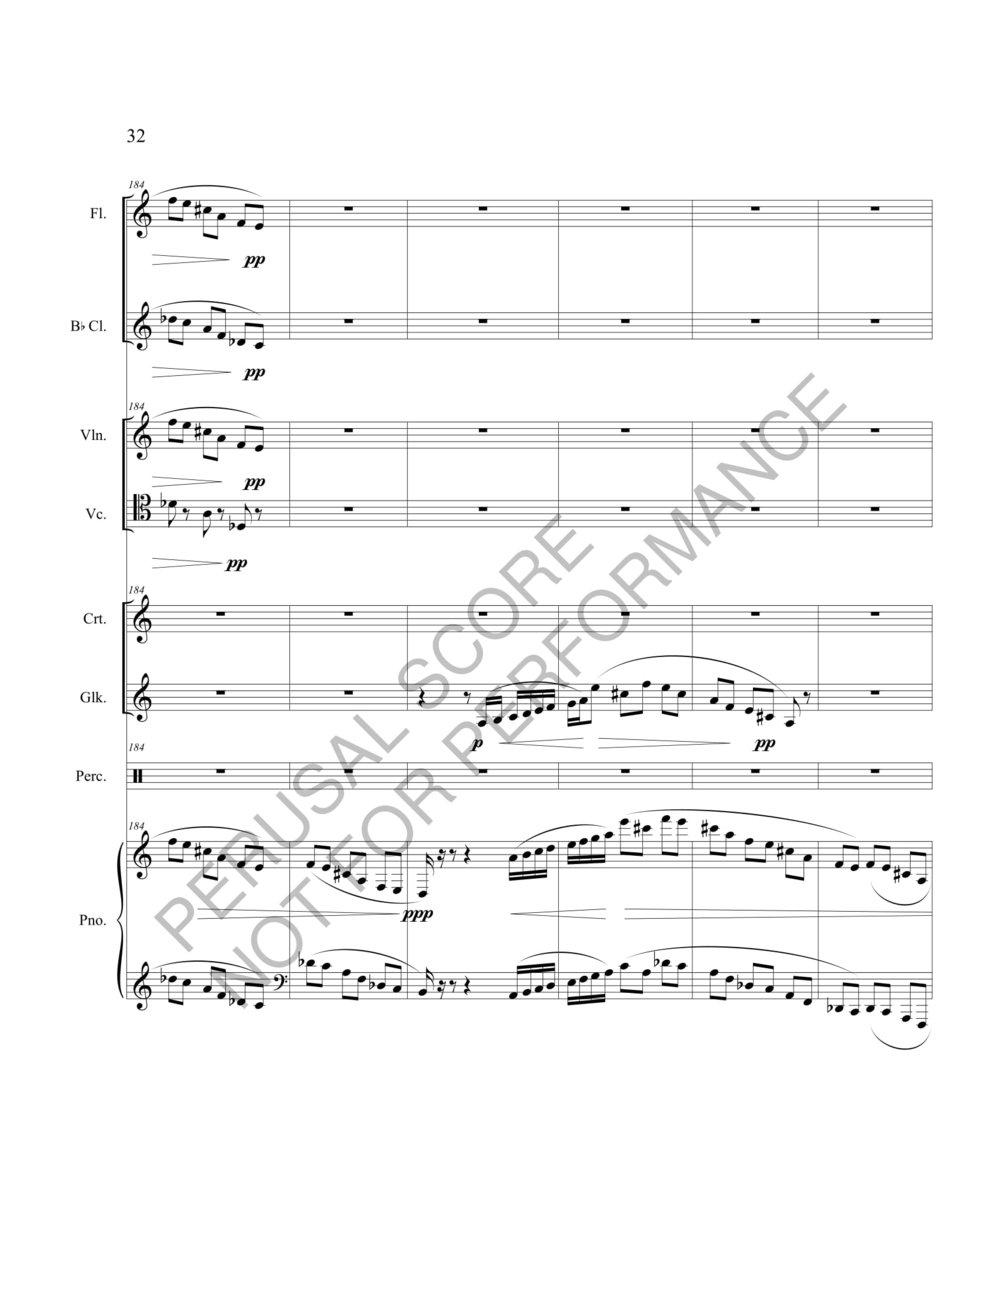 Boyd Terra Liberi Score-watermark-38.jpg